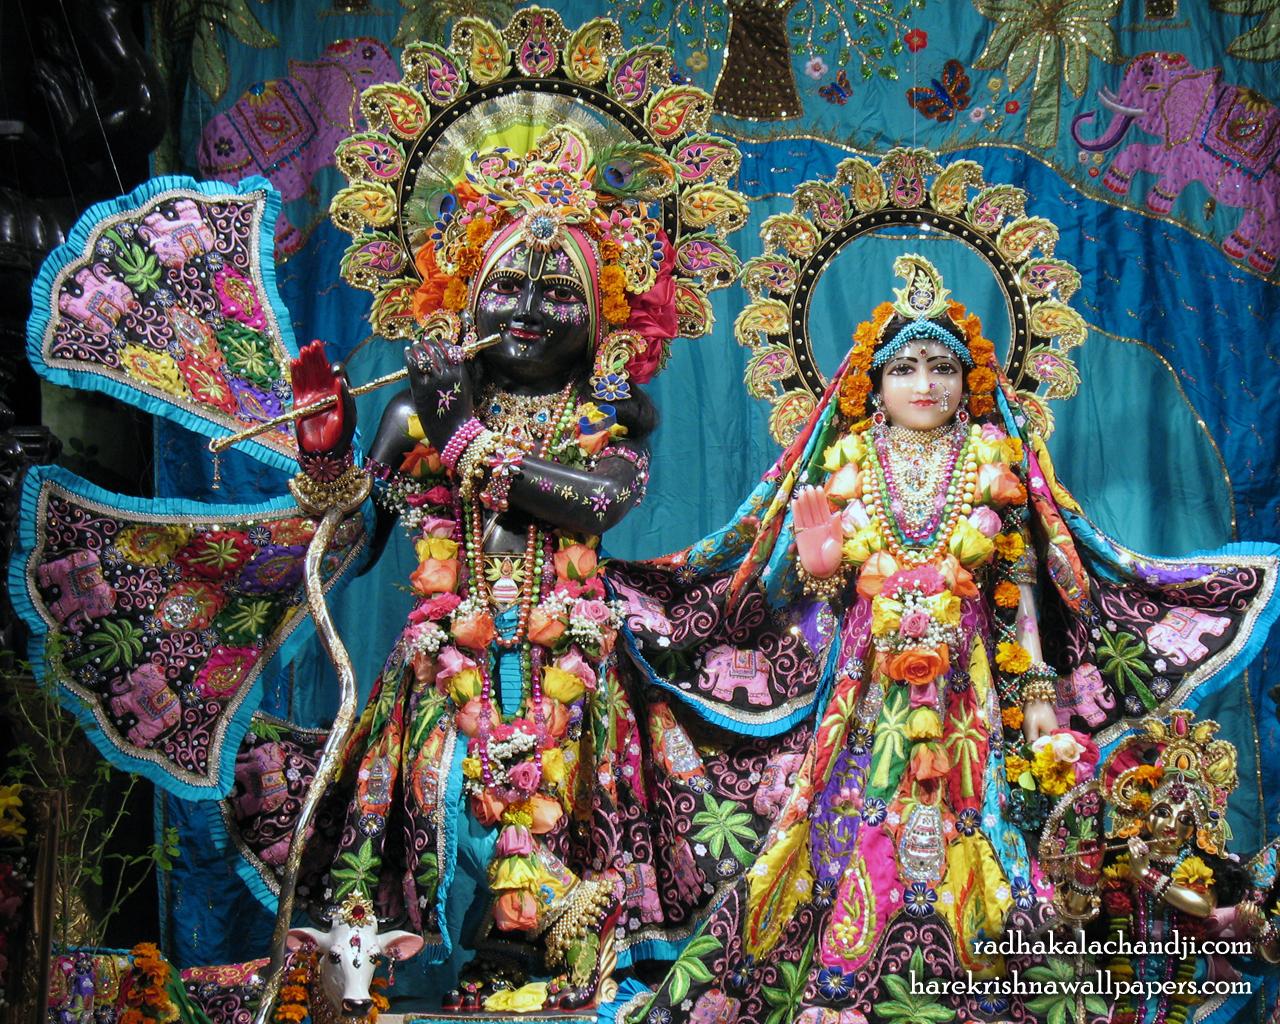 Sri Sri Radha Kalachanda Wallpaper (005) Size 1280x1024 Download